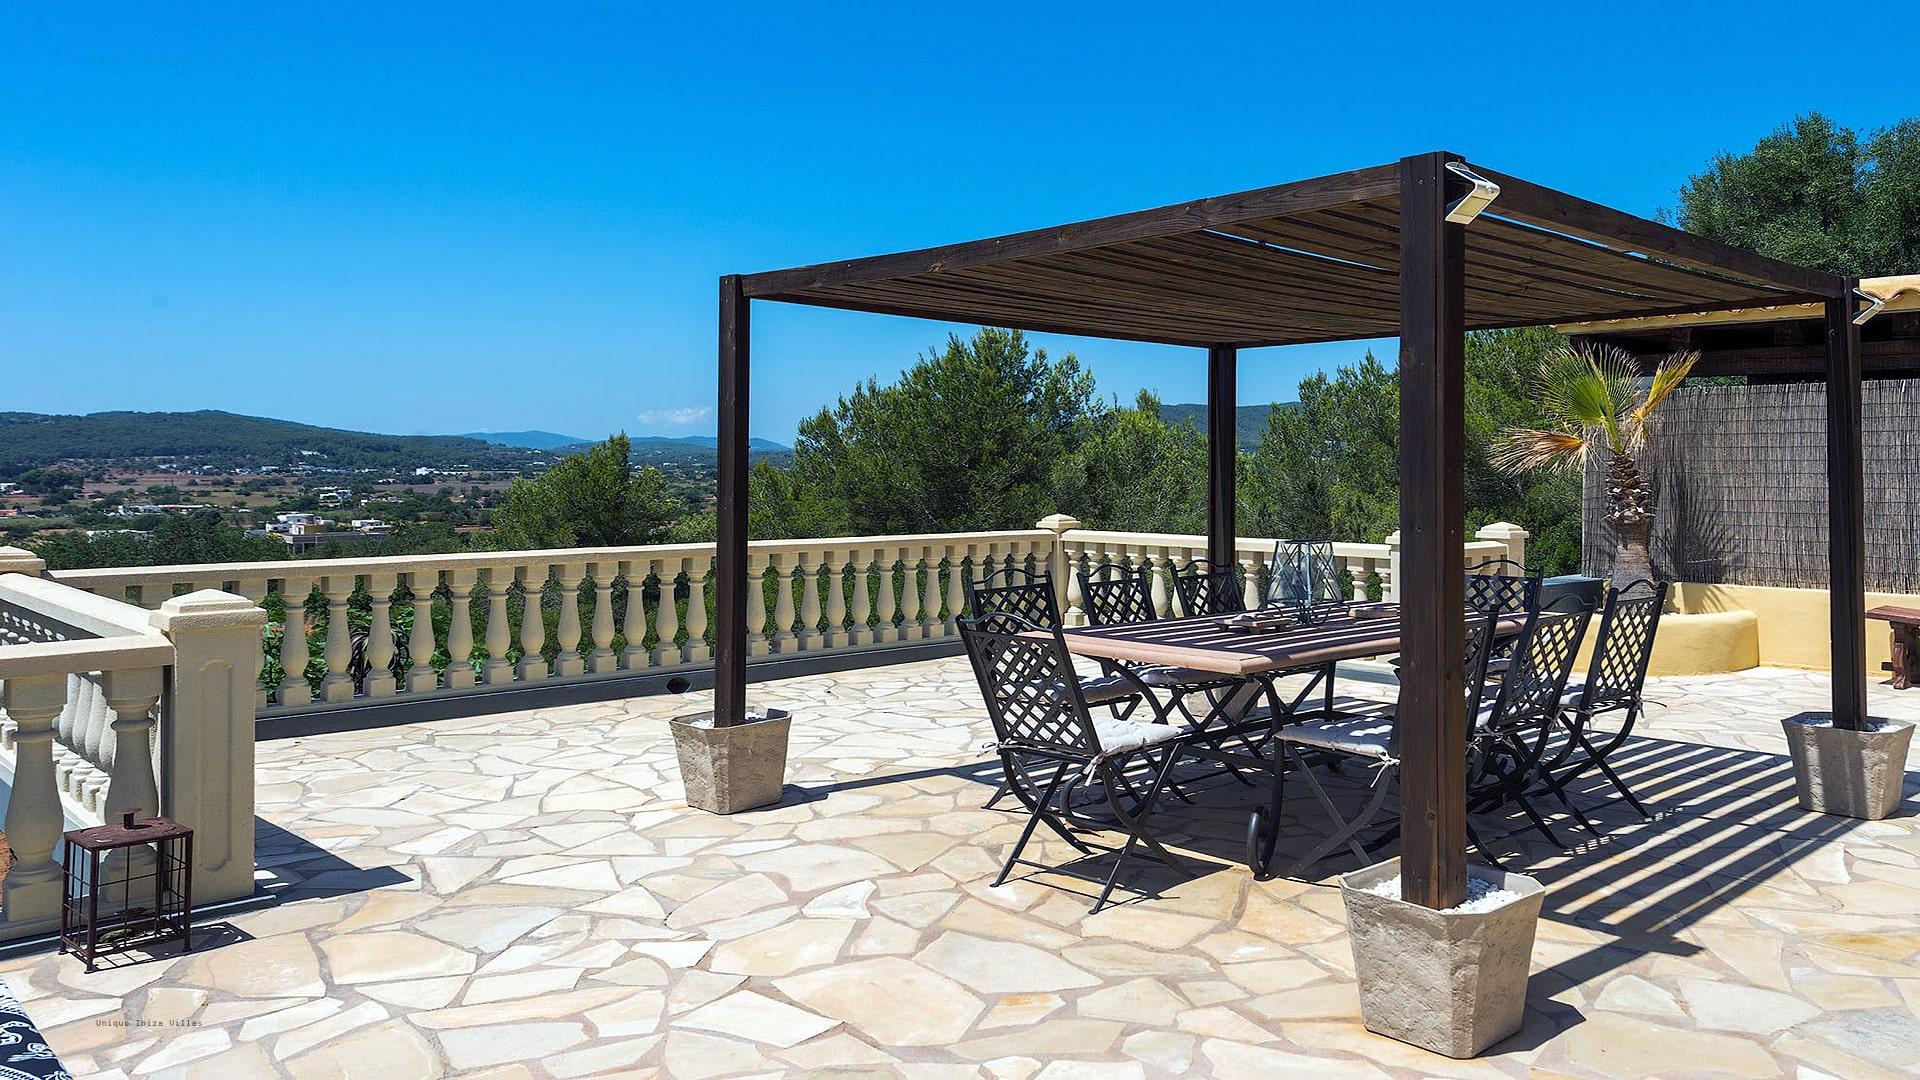 Casa Beni Ibiza 18 Santa Eulalia